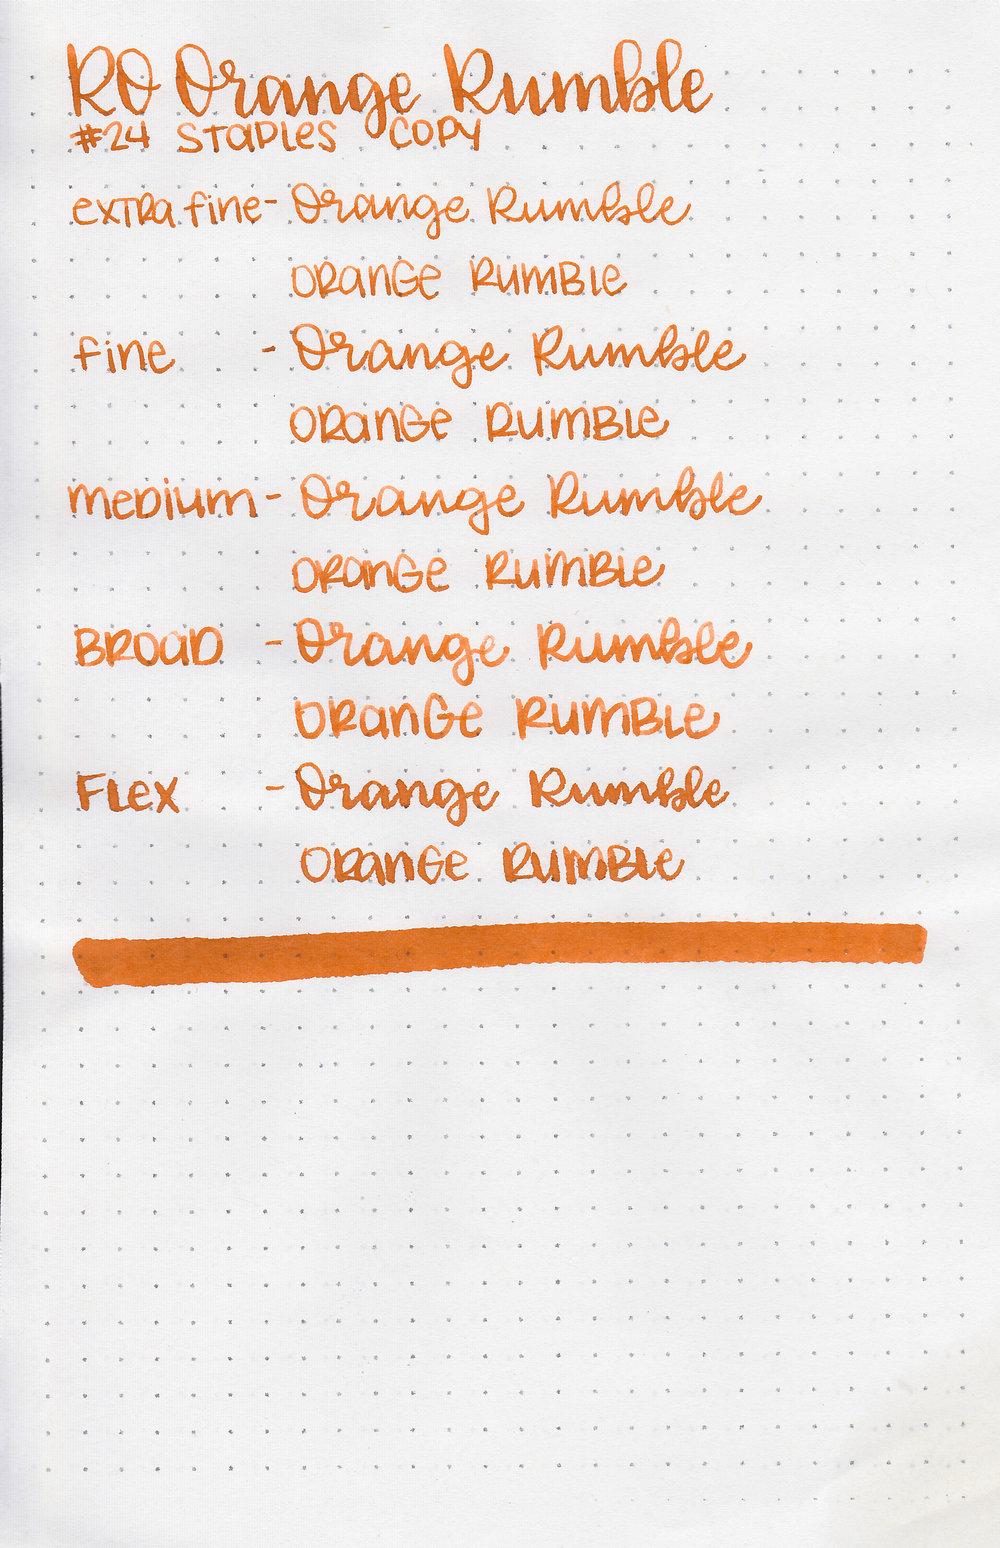 ro-orange-rumble-11.jpg